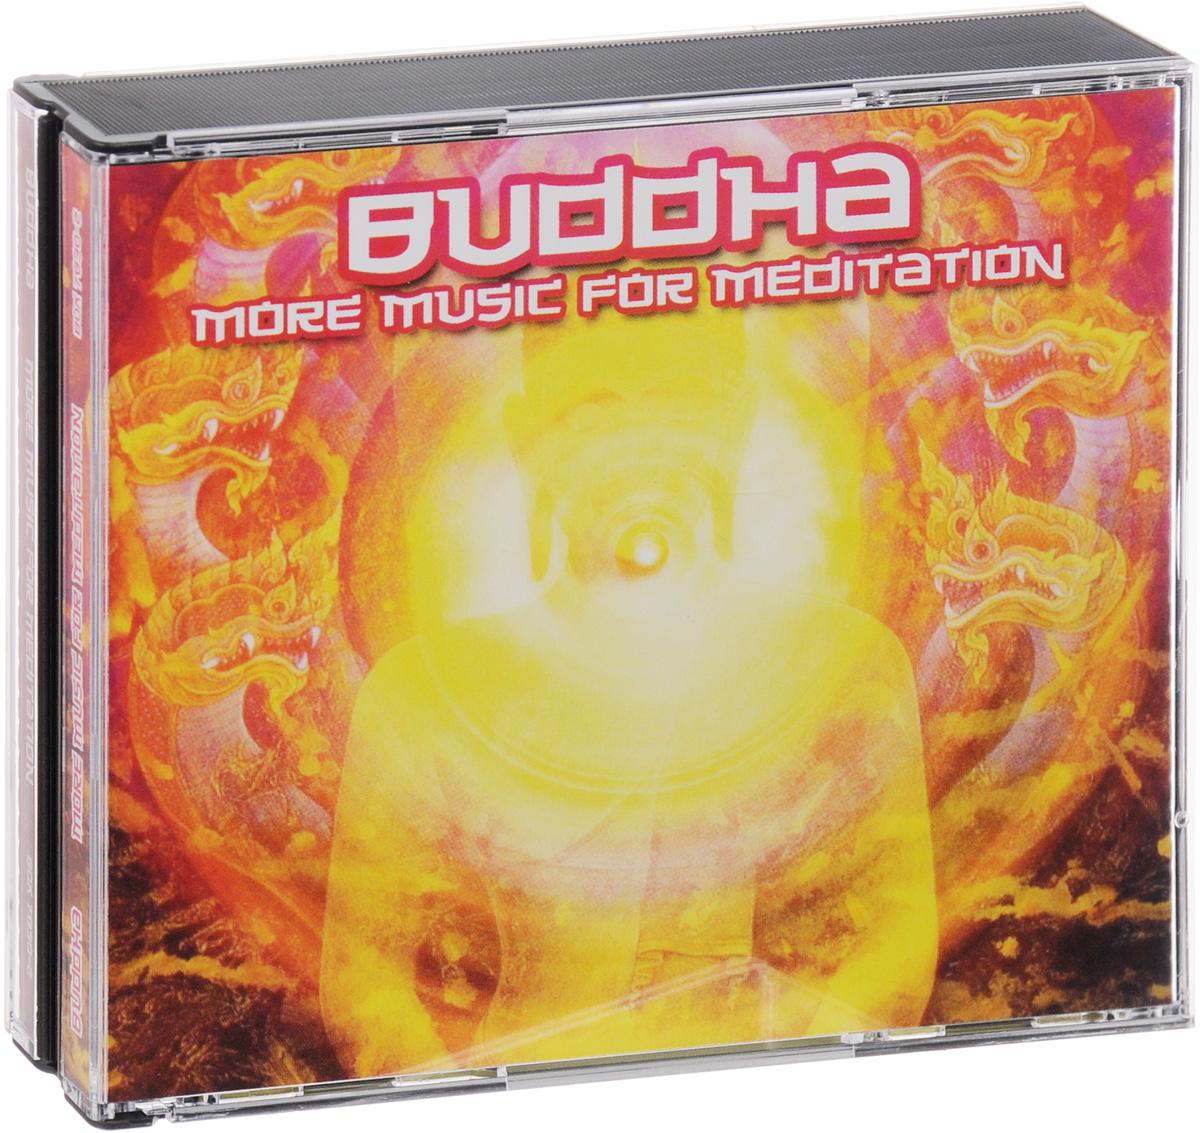 Buddha. More Music For Meditation (3 CD) 2008 3 Audio CD